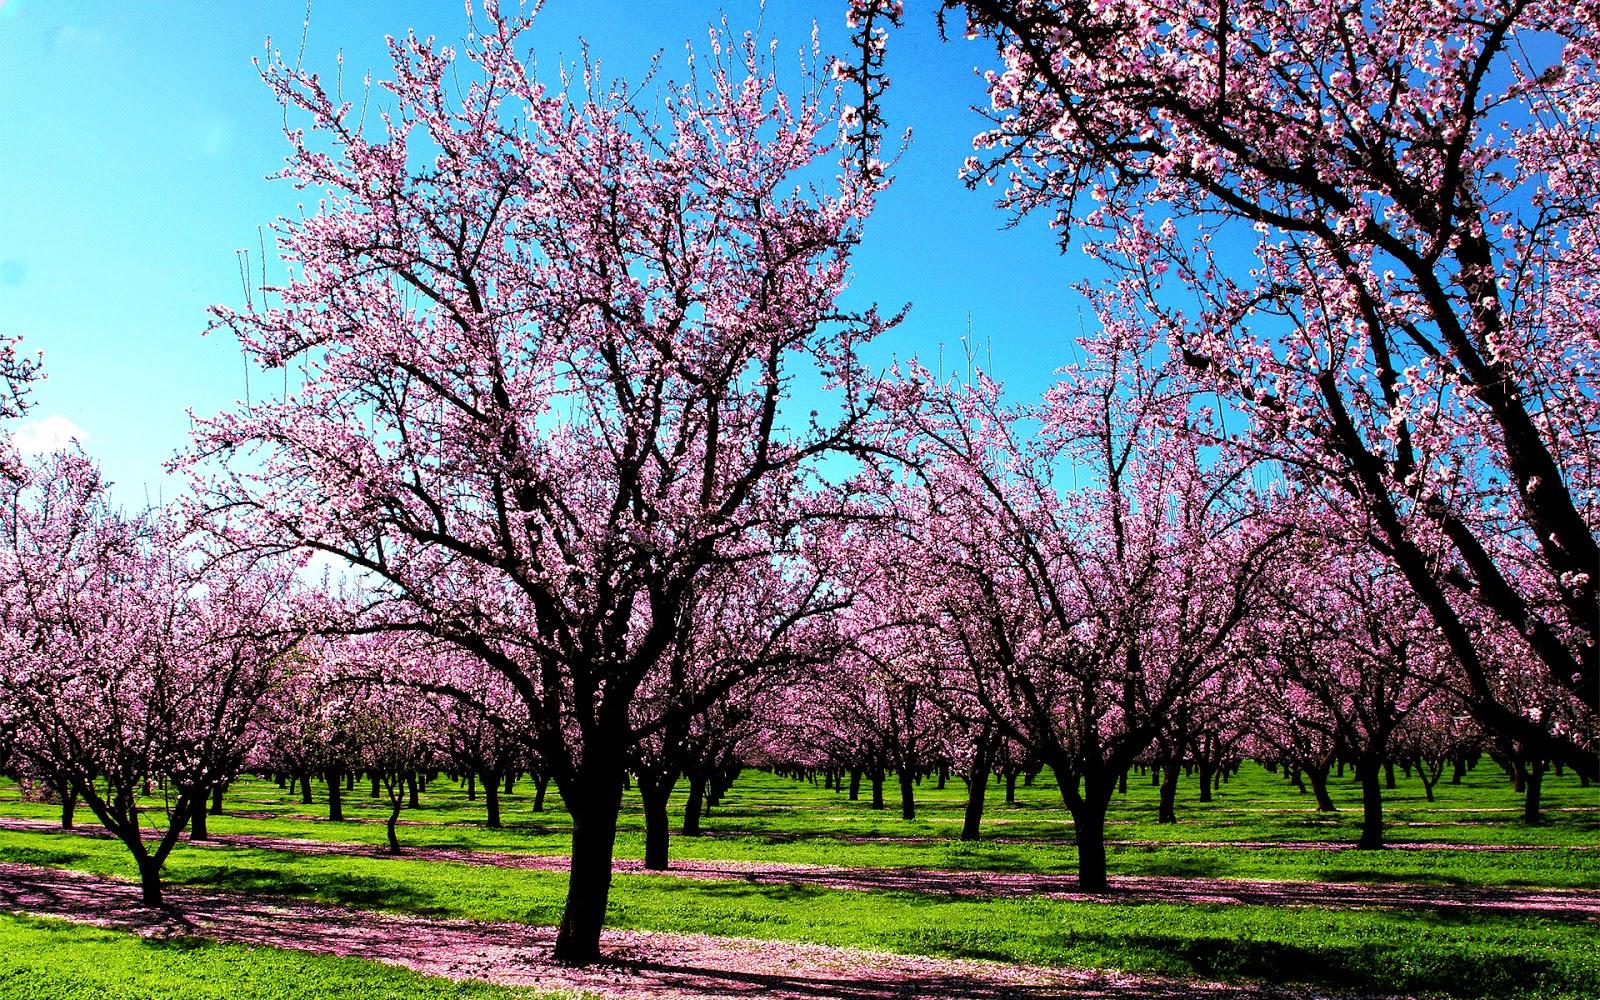 Wallpapers 2015 SpringSummerWinter Seasons Desktop Images Full 1600x1000